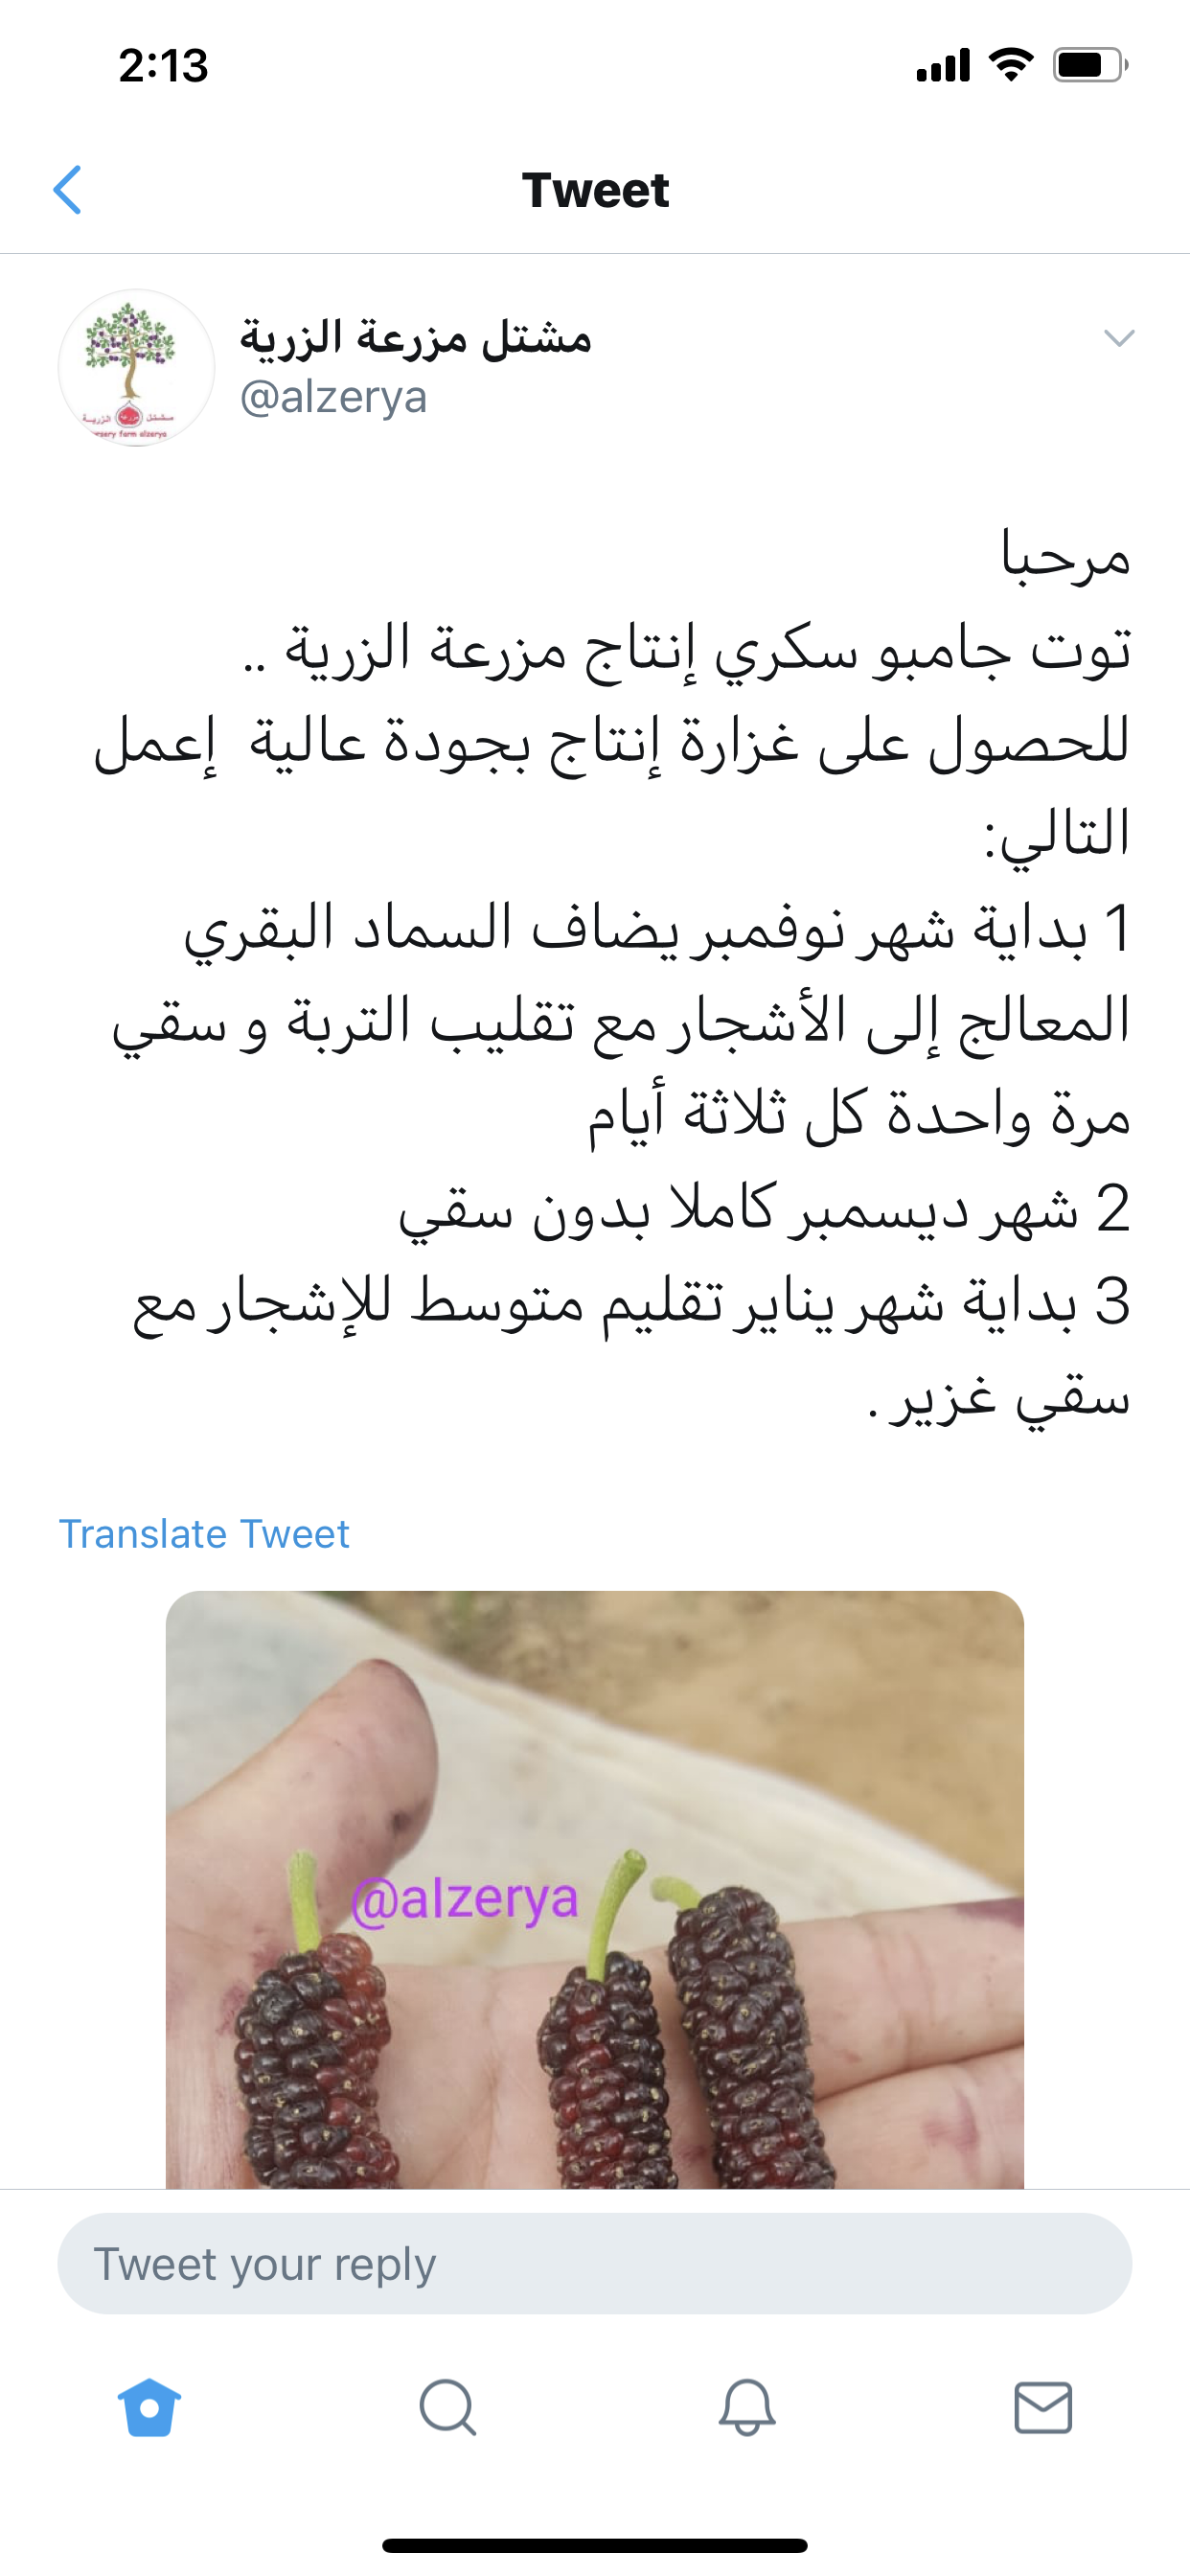 Pin By Maryam Alali On زراعه In 2020 Tweet